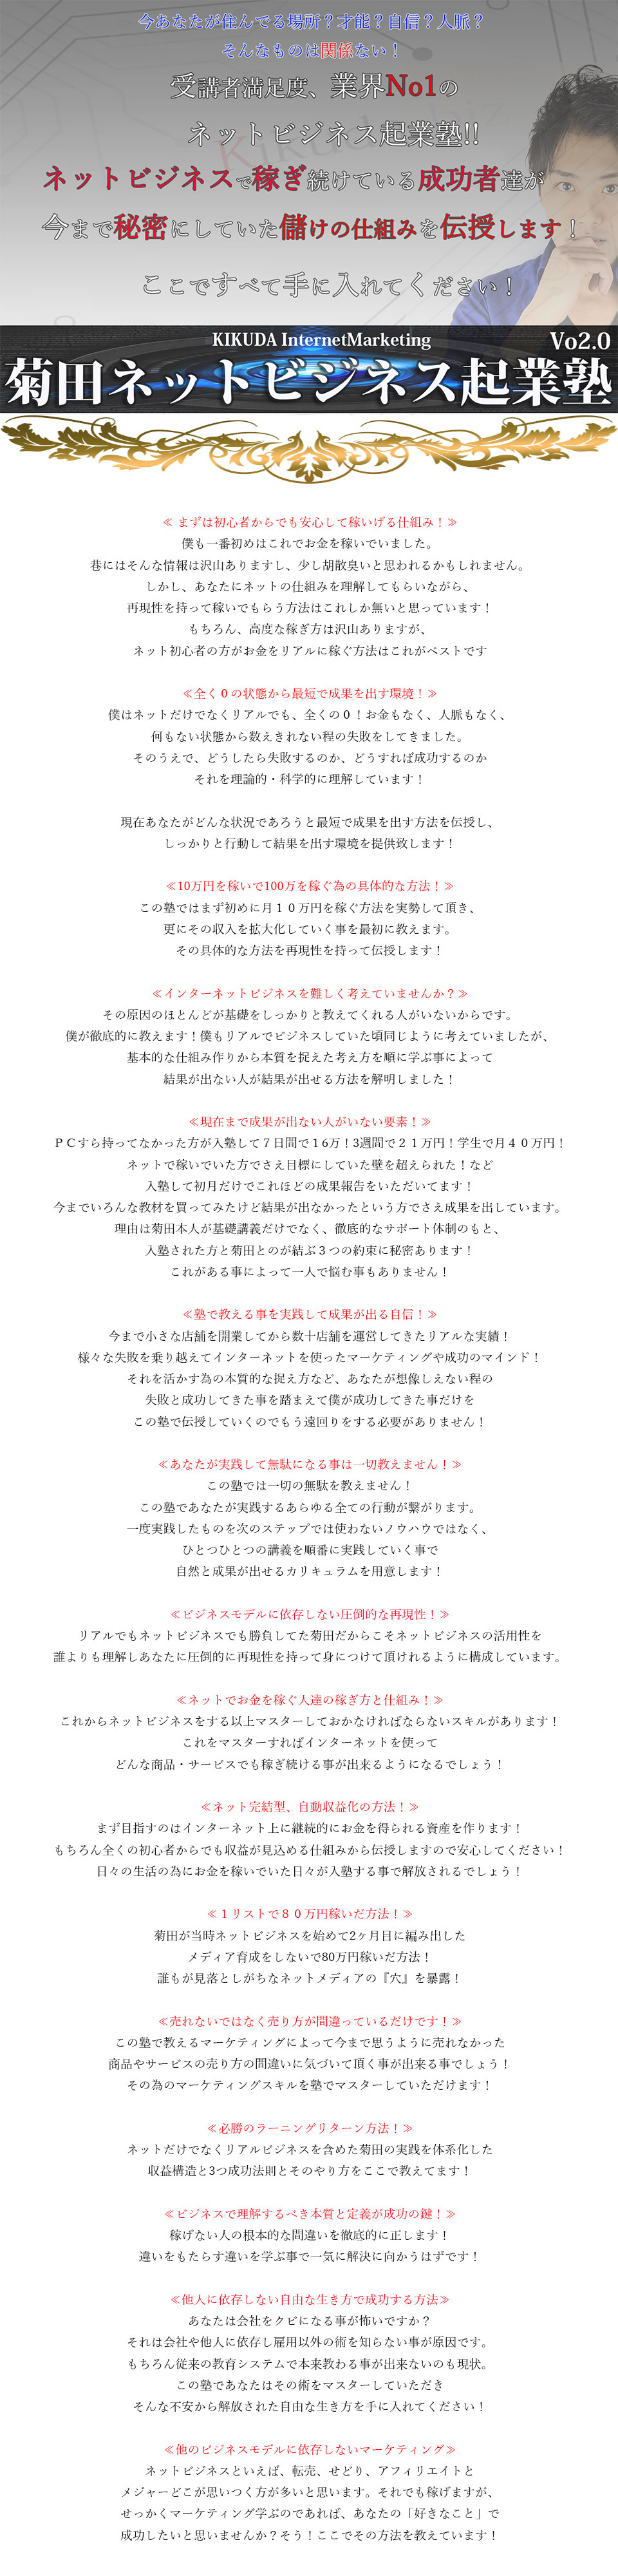 LP菊田塾案内P01.jpg